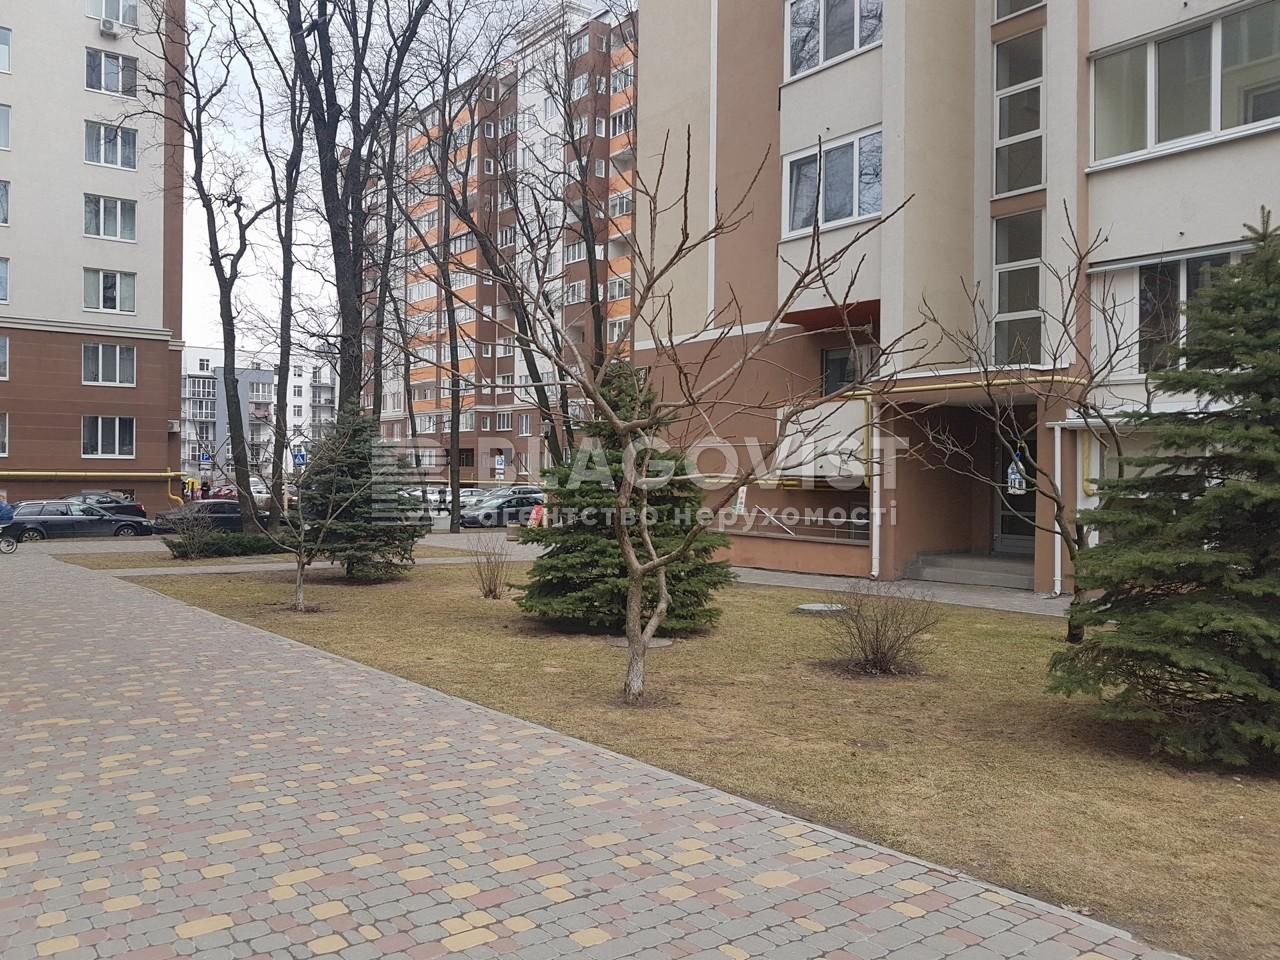 Квартира E-40784, Леси Украинки, 4, Софиевская Борщаговка - Фото 4